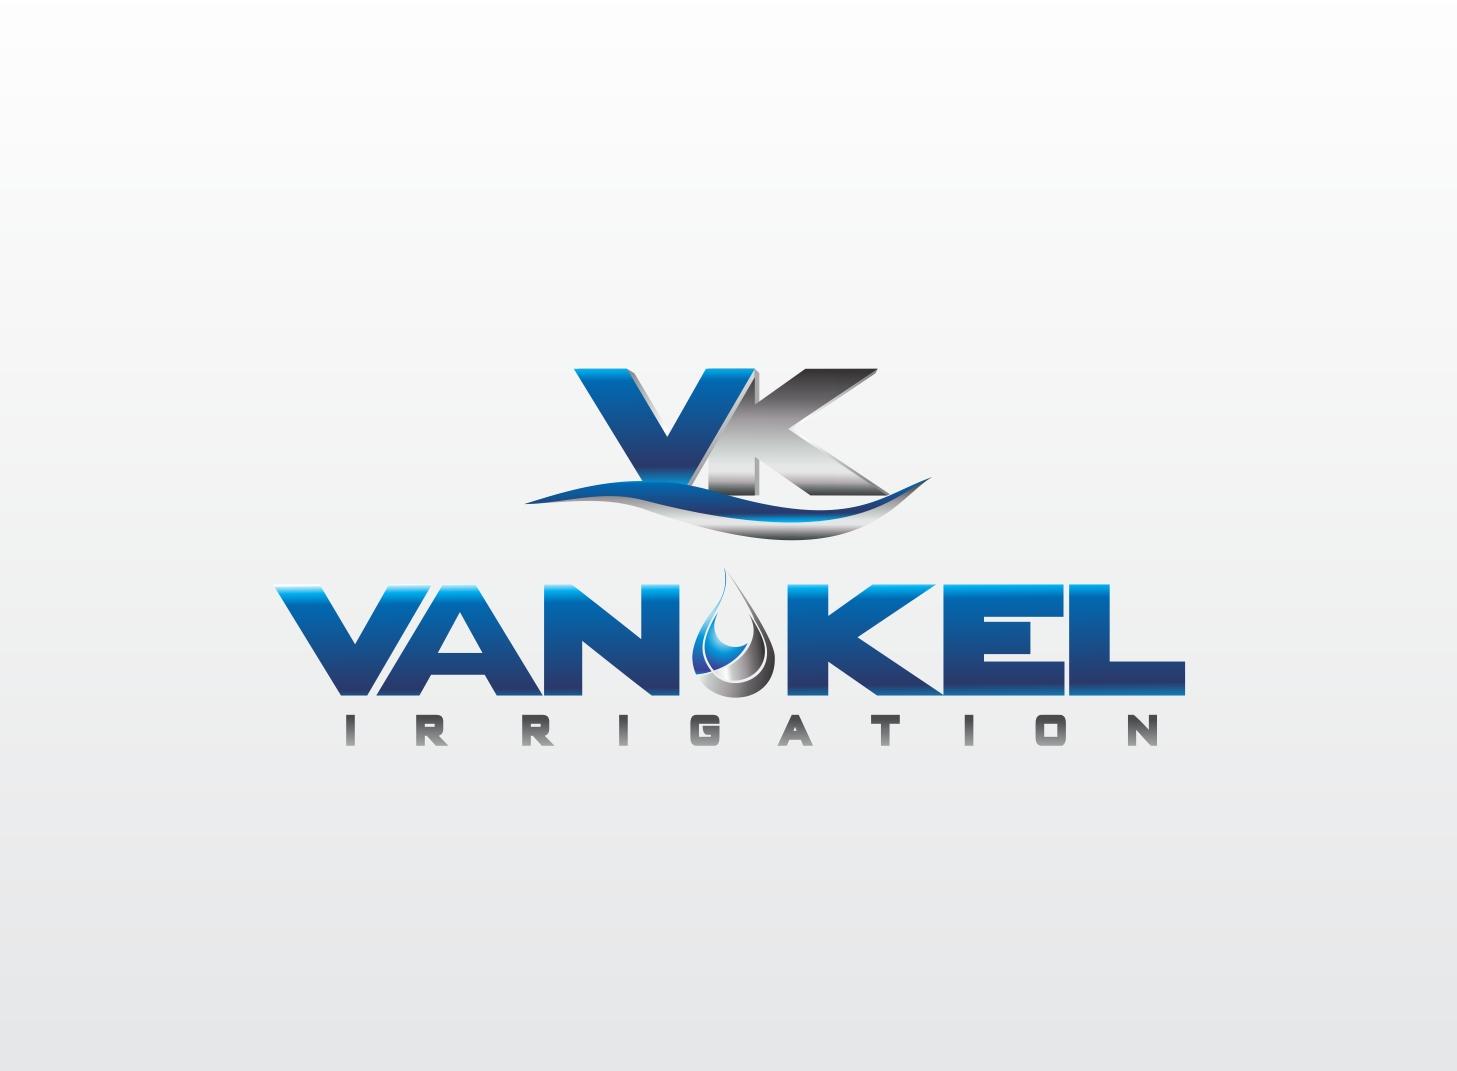 Logo Design by Zdravko Krulj - Entry No. 234 in the Logo Design Contest Van-Kel Irrigation Logo Design.